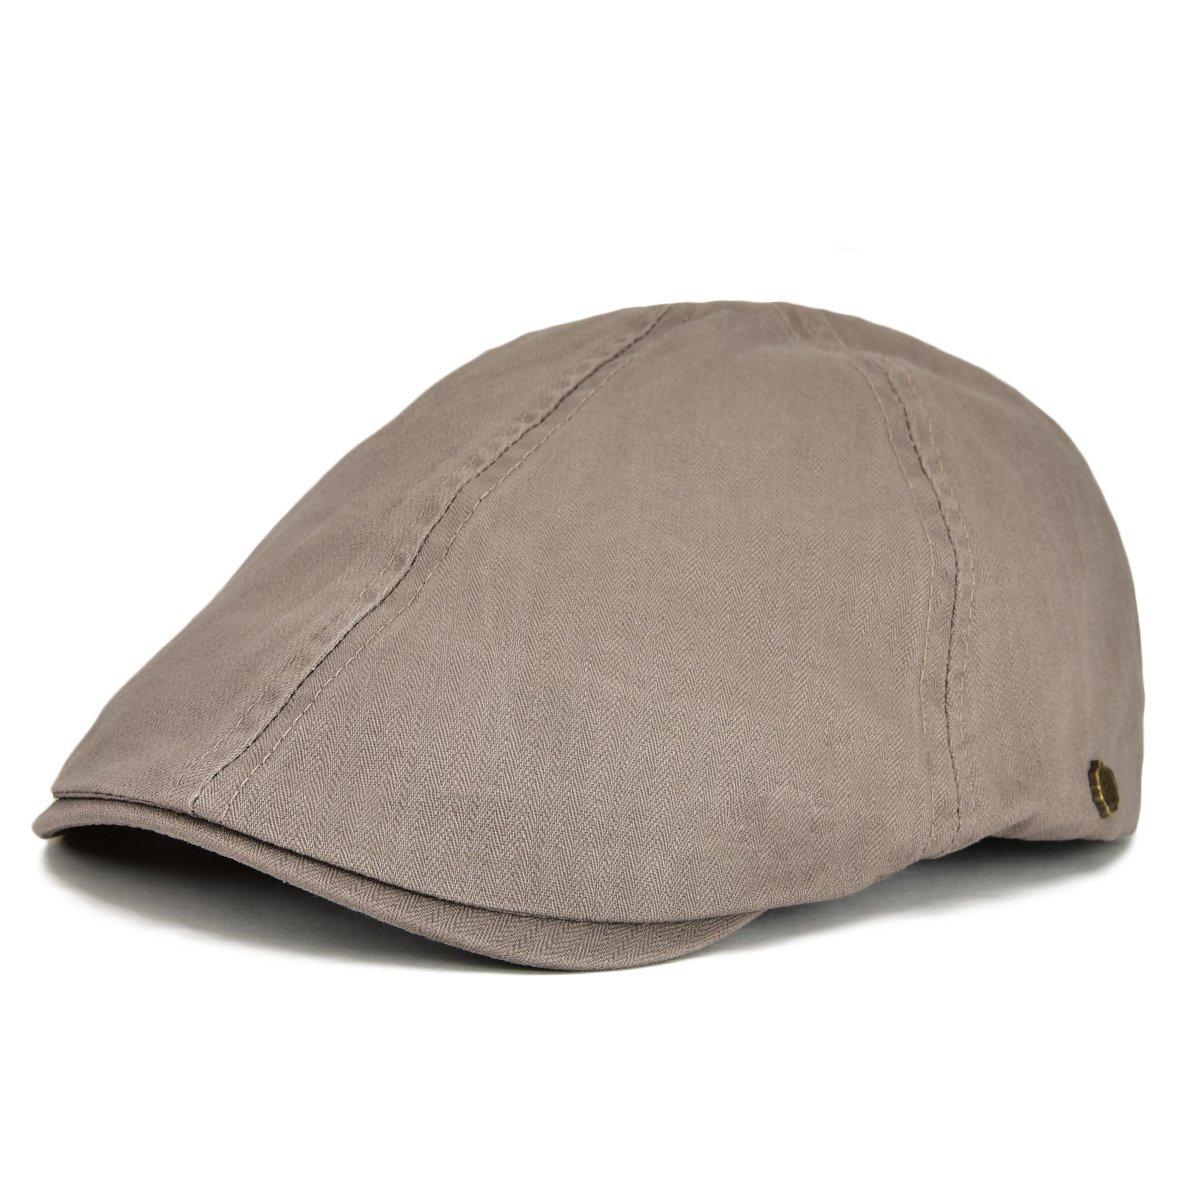 VOBOOM Ivy Caps Herringbone Cotton Flat caps Light Weight Newsboy Caps Cabbie Hat BDMZ137-Blk